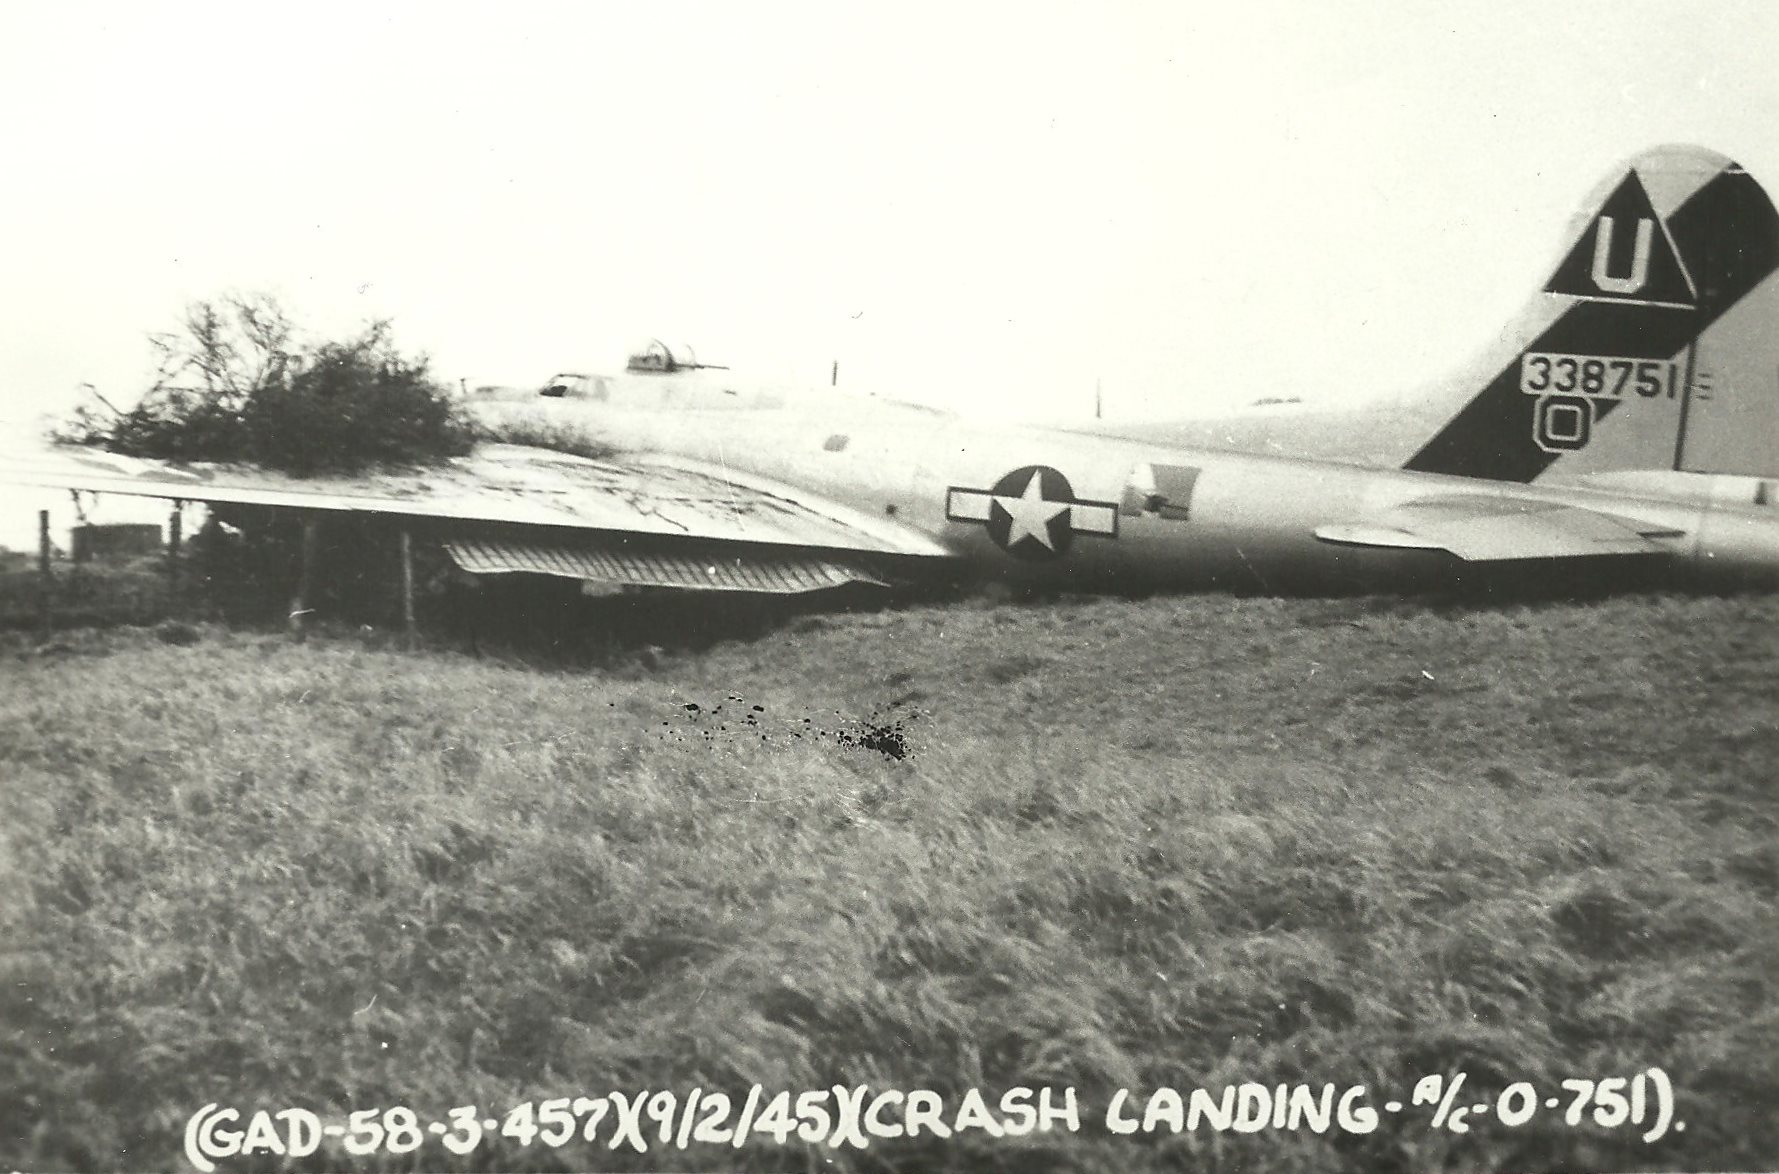 B-17 #43-38751